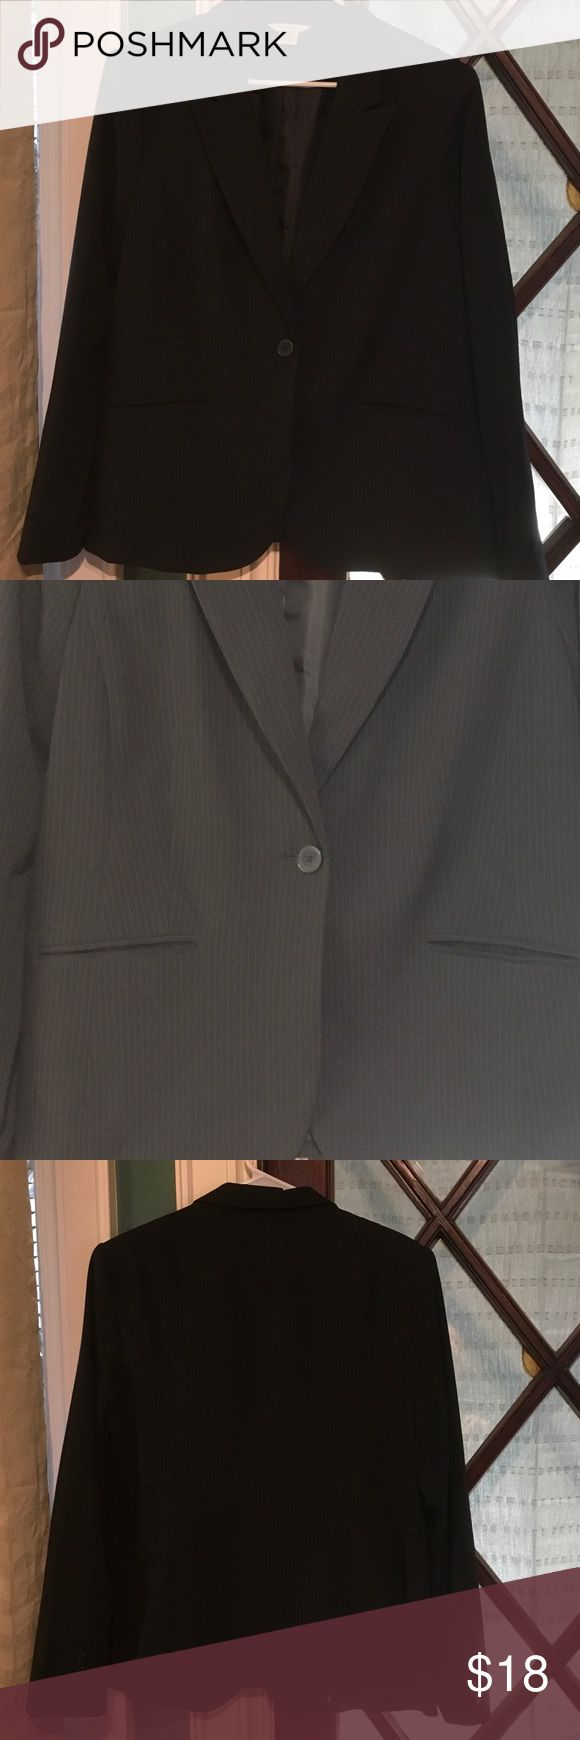 Liz Claiborne fully lined pinstripe suit jacket Liz Claiborne fully lined pinstripe suit jacket Liz Claiborne Jackets & Coats Blazers